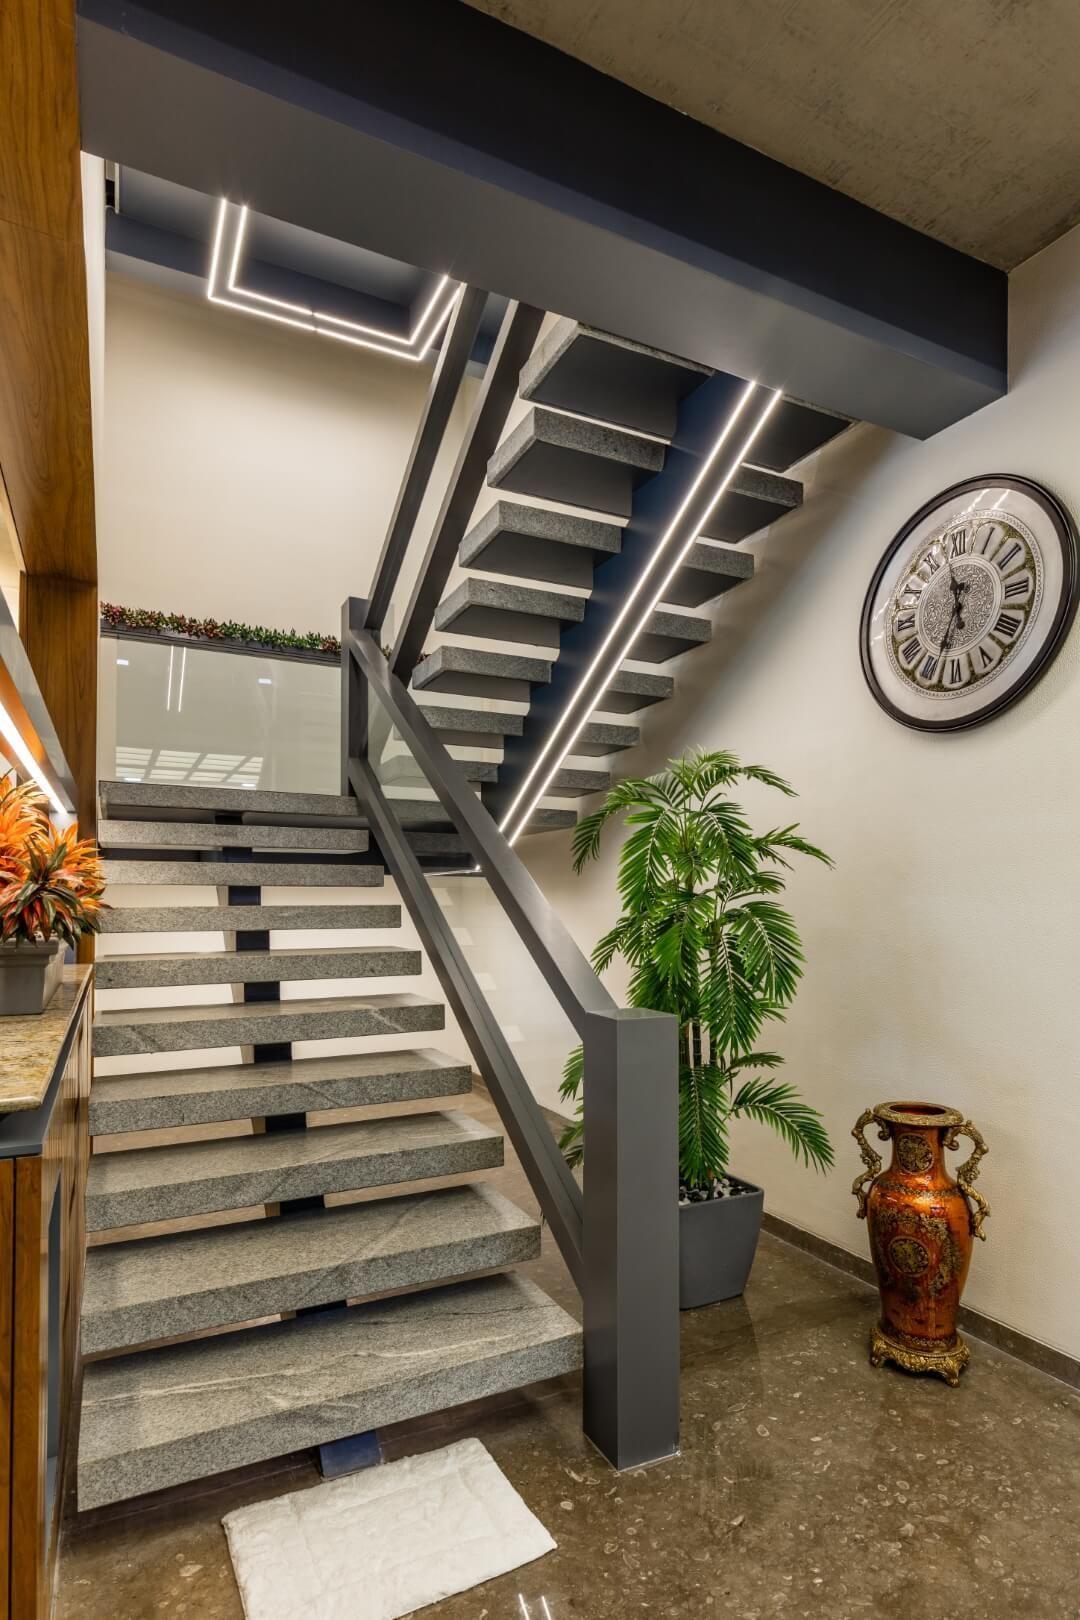 Mahadev Bungalow   Bungalow, Railing design, Stairs design